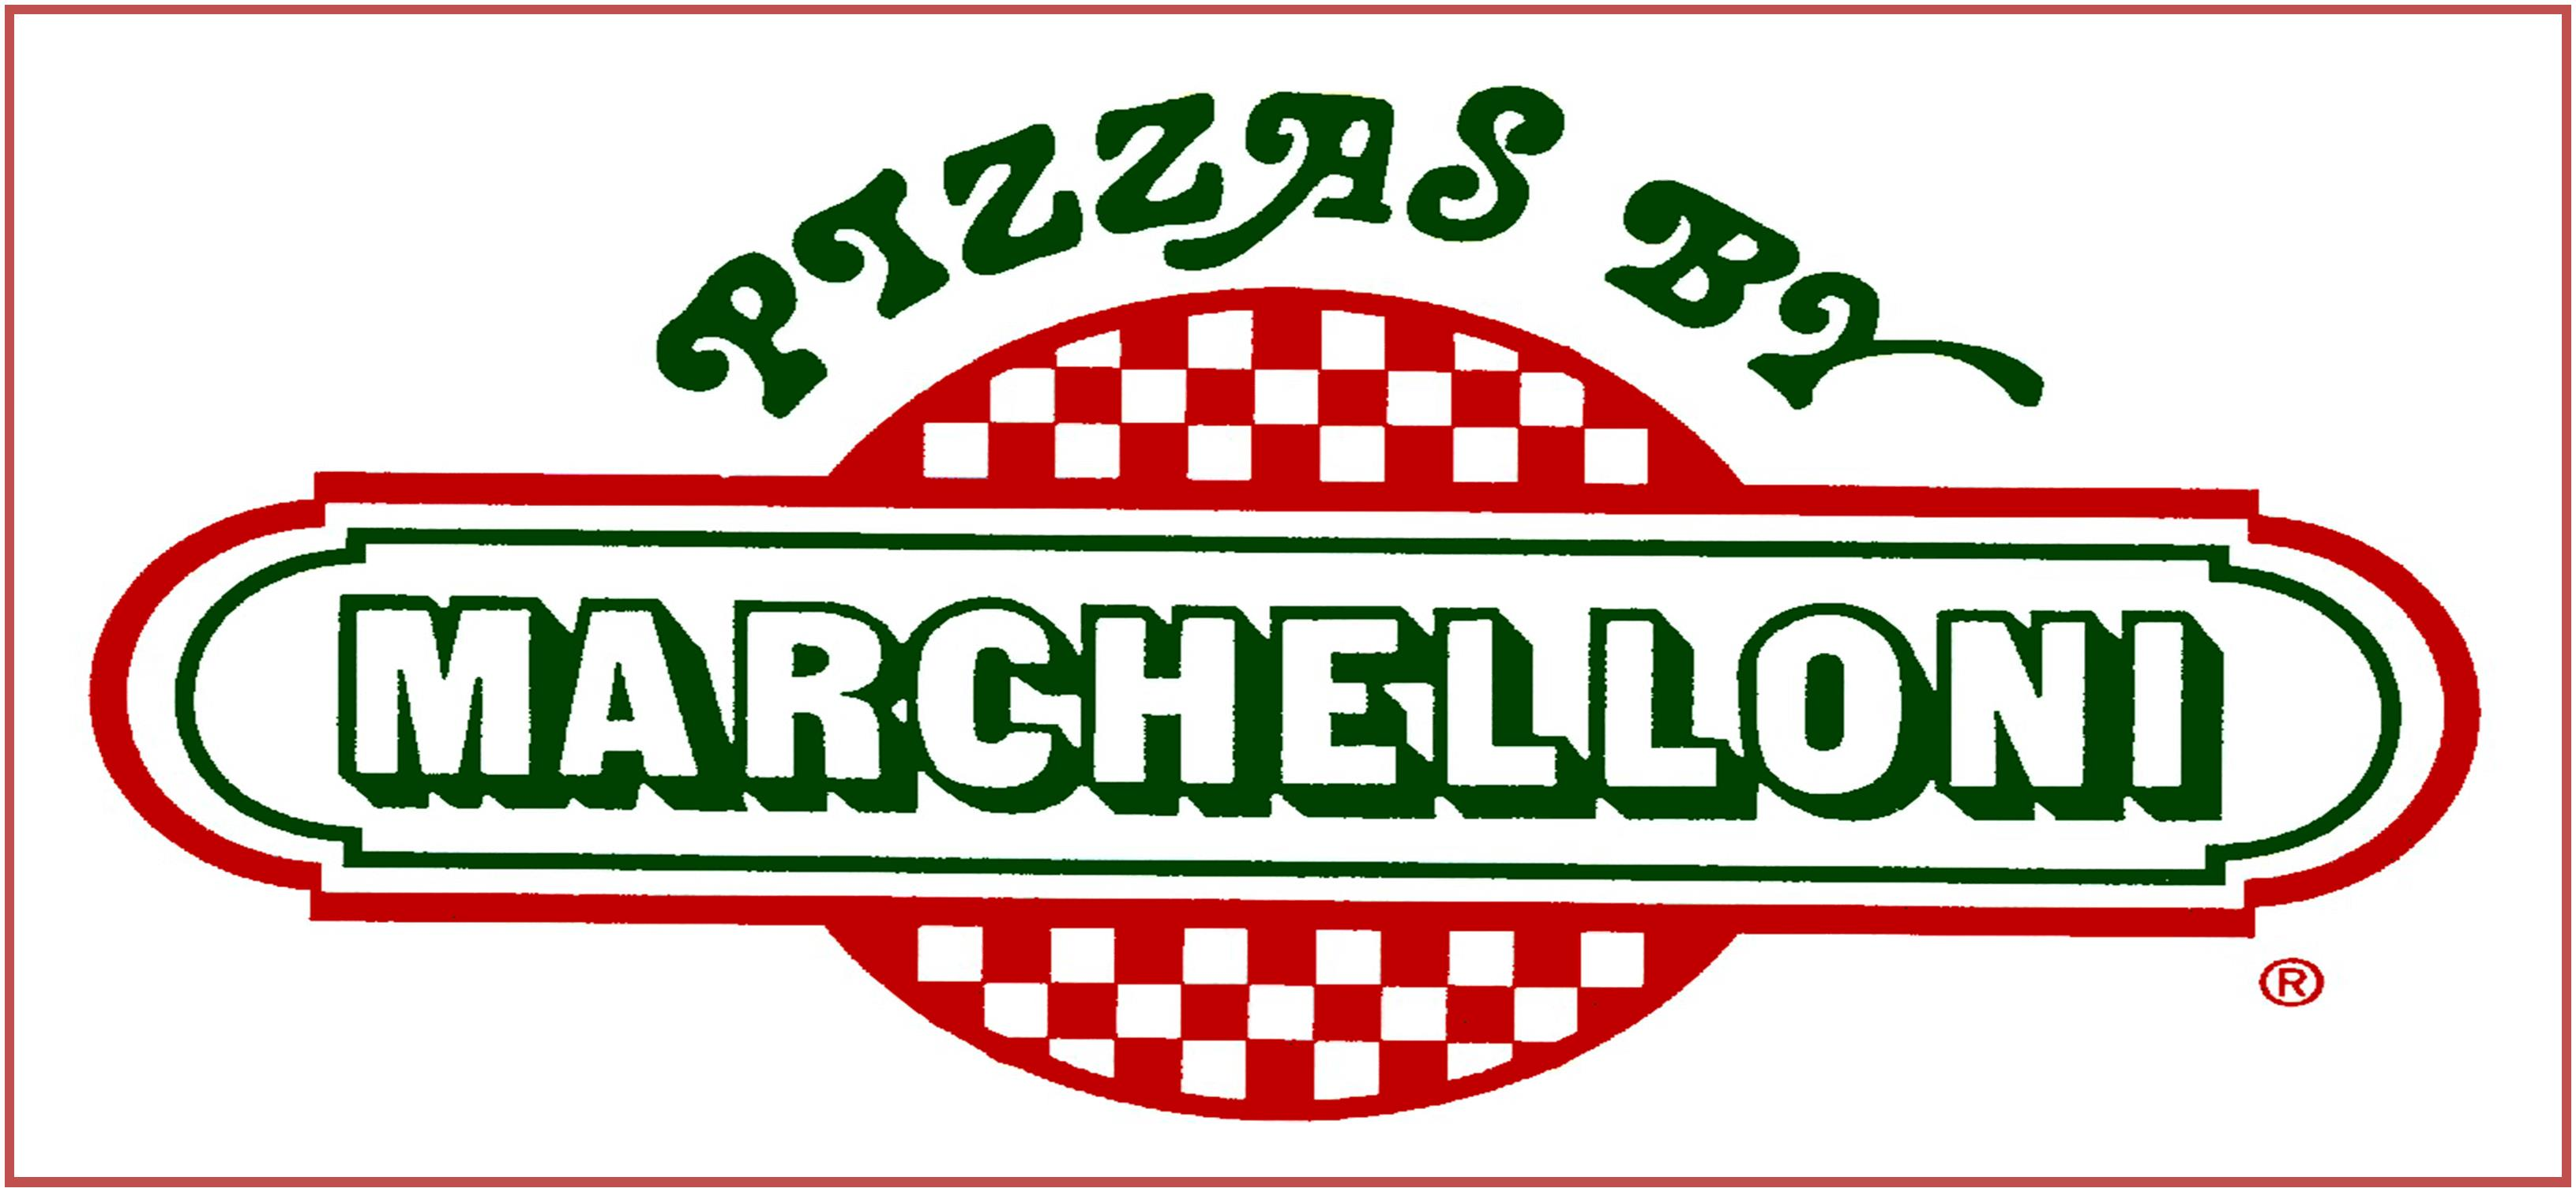 Marchelloni Logo Fairbury Illinois Attractions